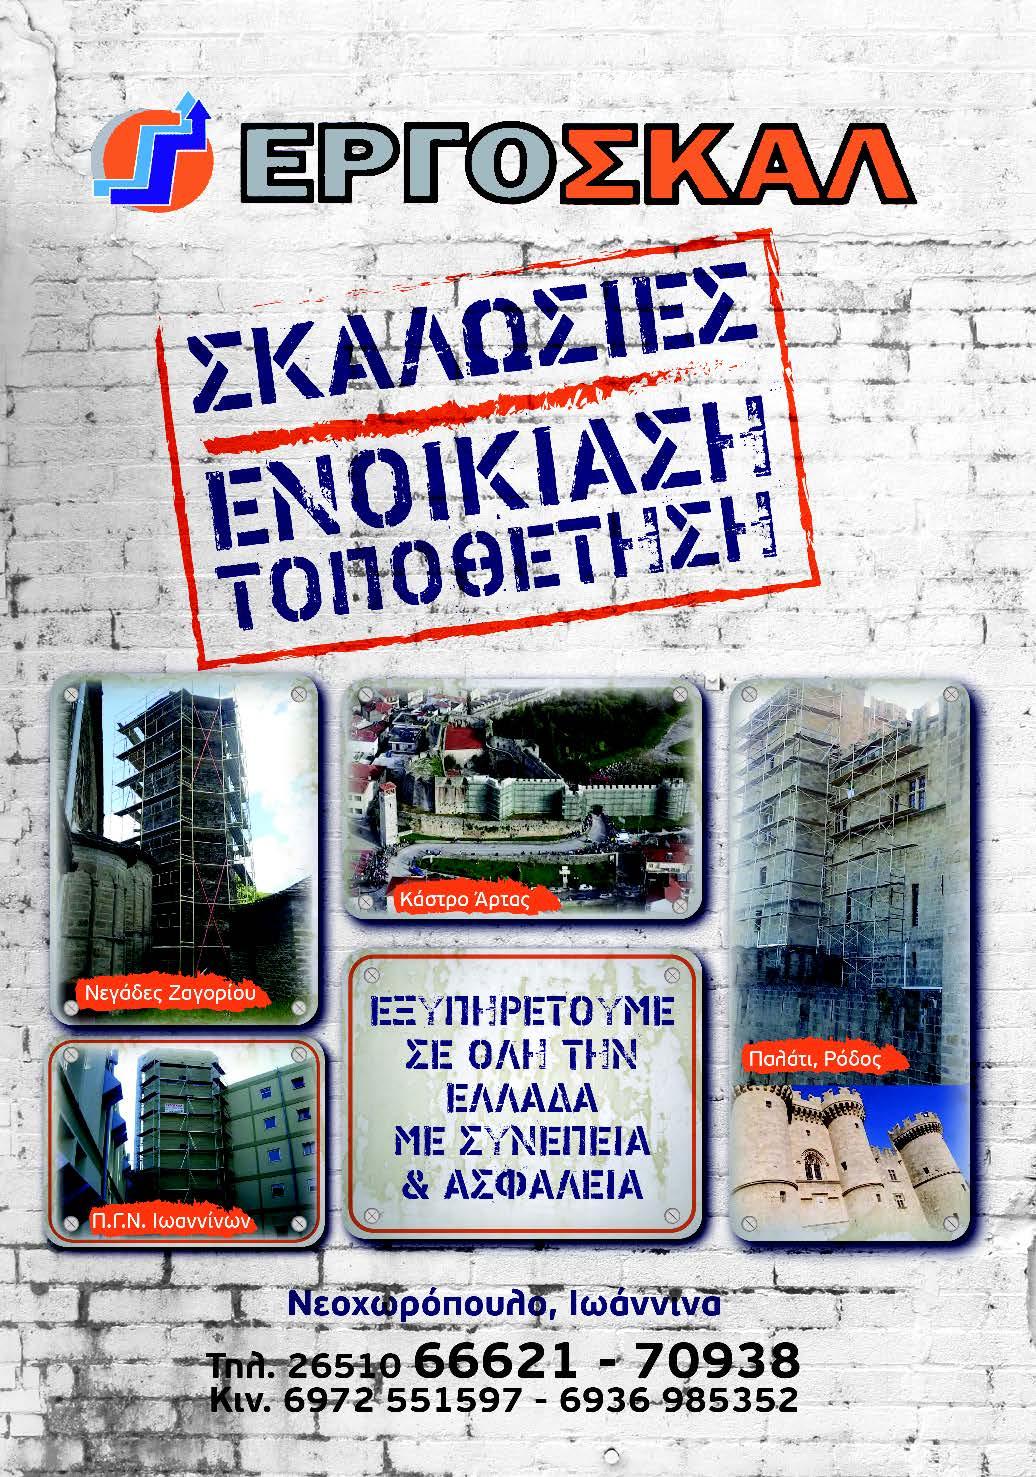 EOI-2020_Page_259_Image_0003